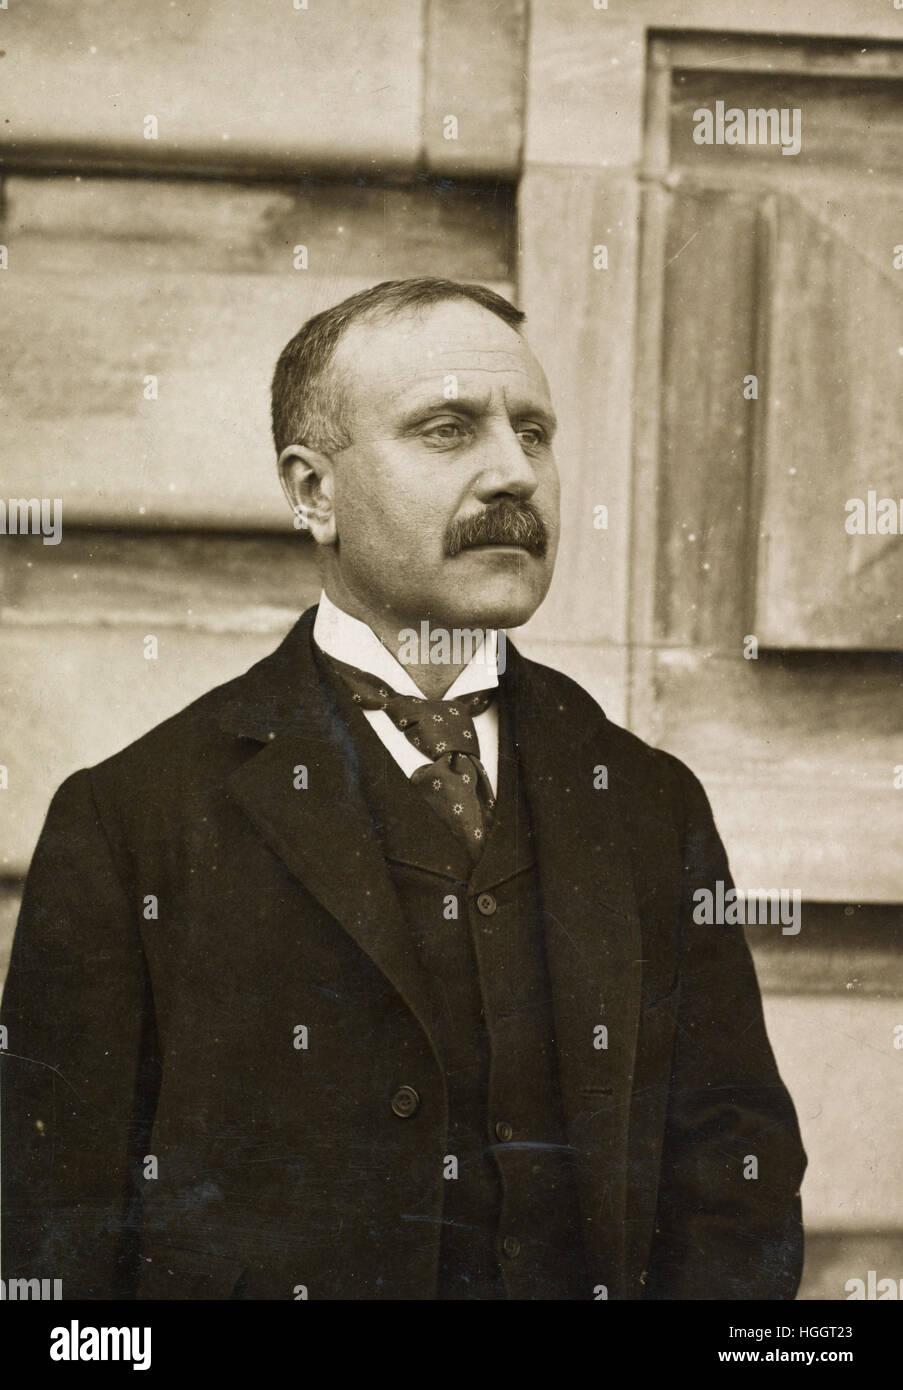 Portrait photograph of William Williams, Commissioner of Immigration at Ellis Island  - Ellis Island Immigration - Stock Image